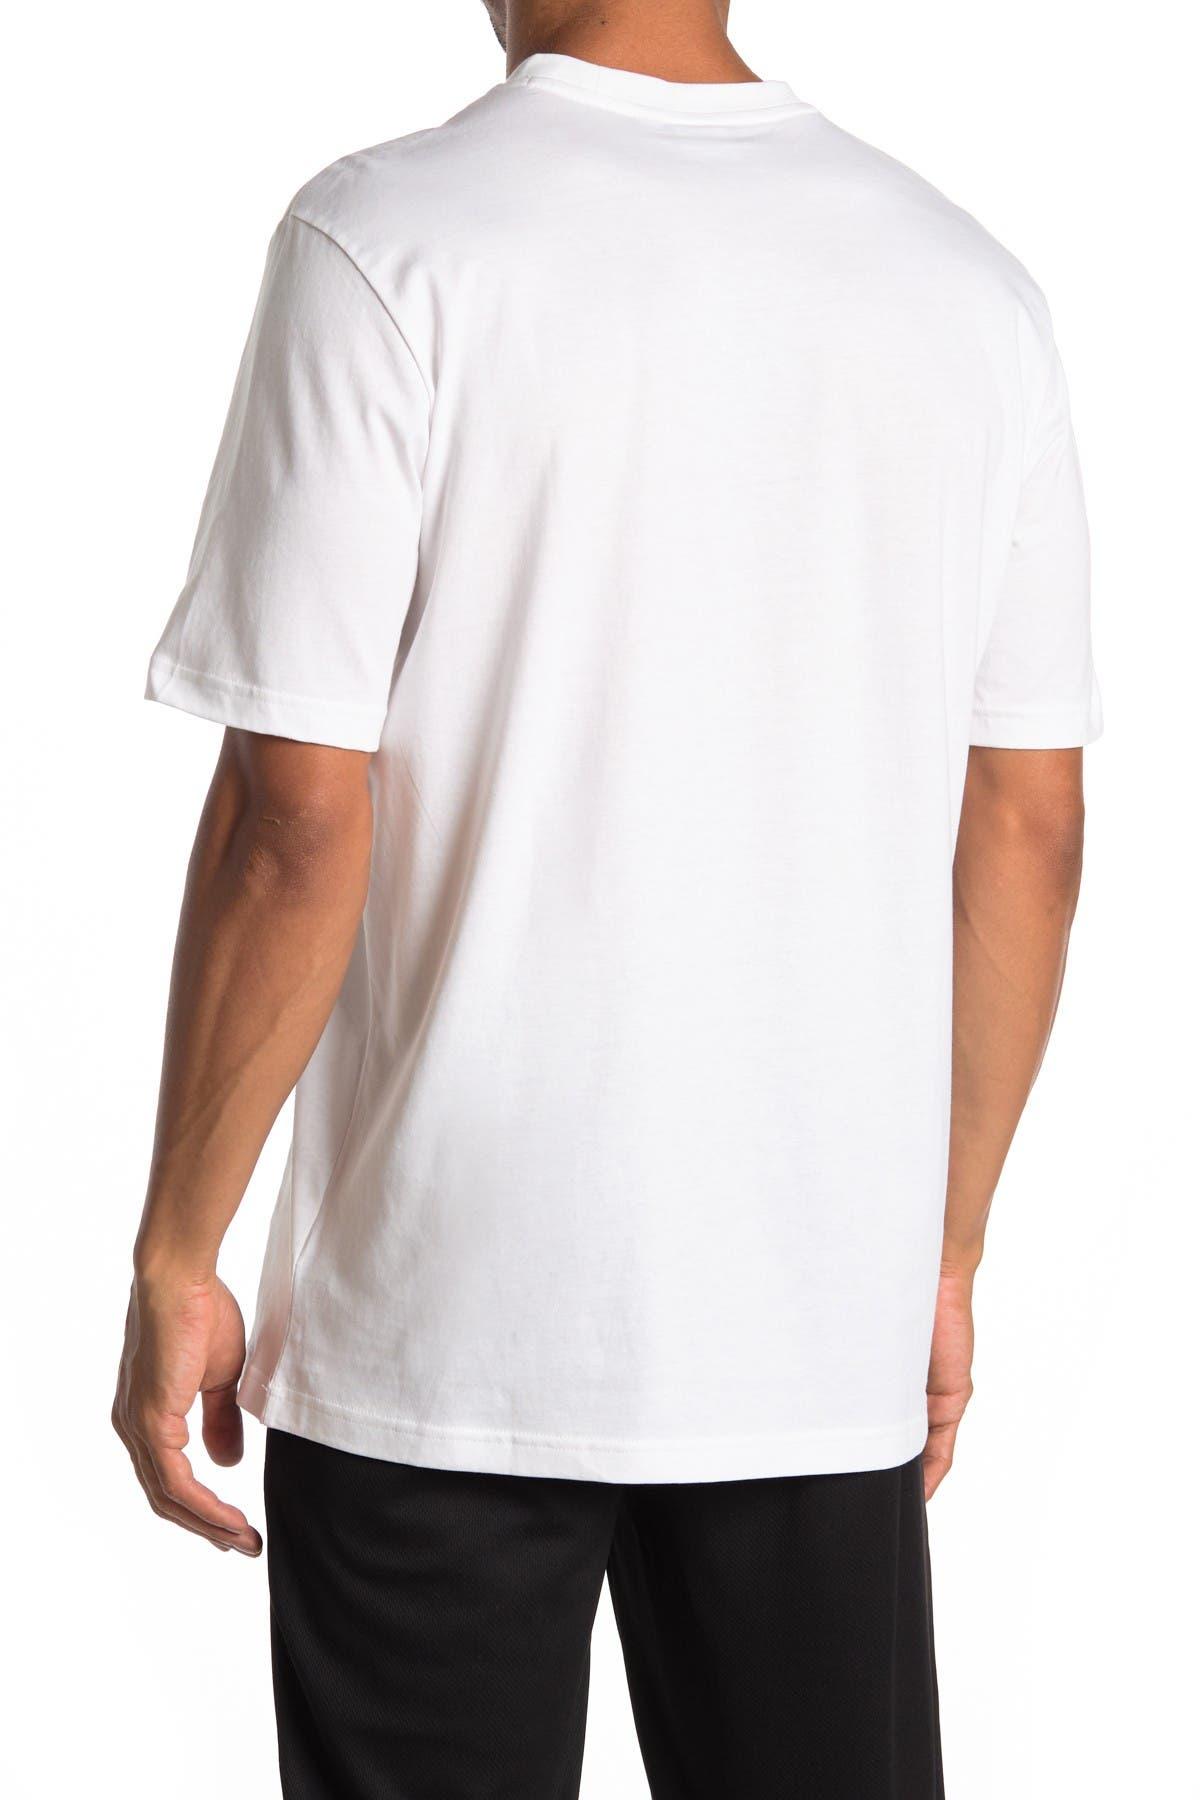 Image of PUMA Tie Dye Graphic T-Shirt